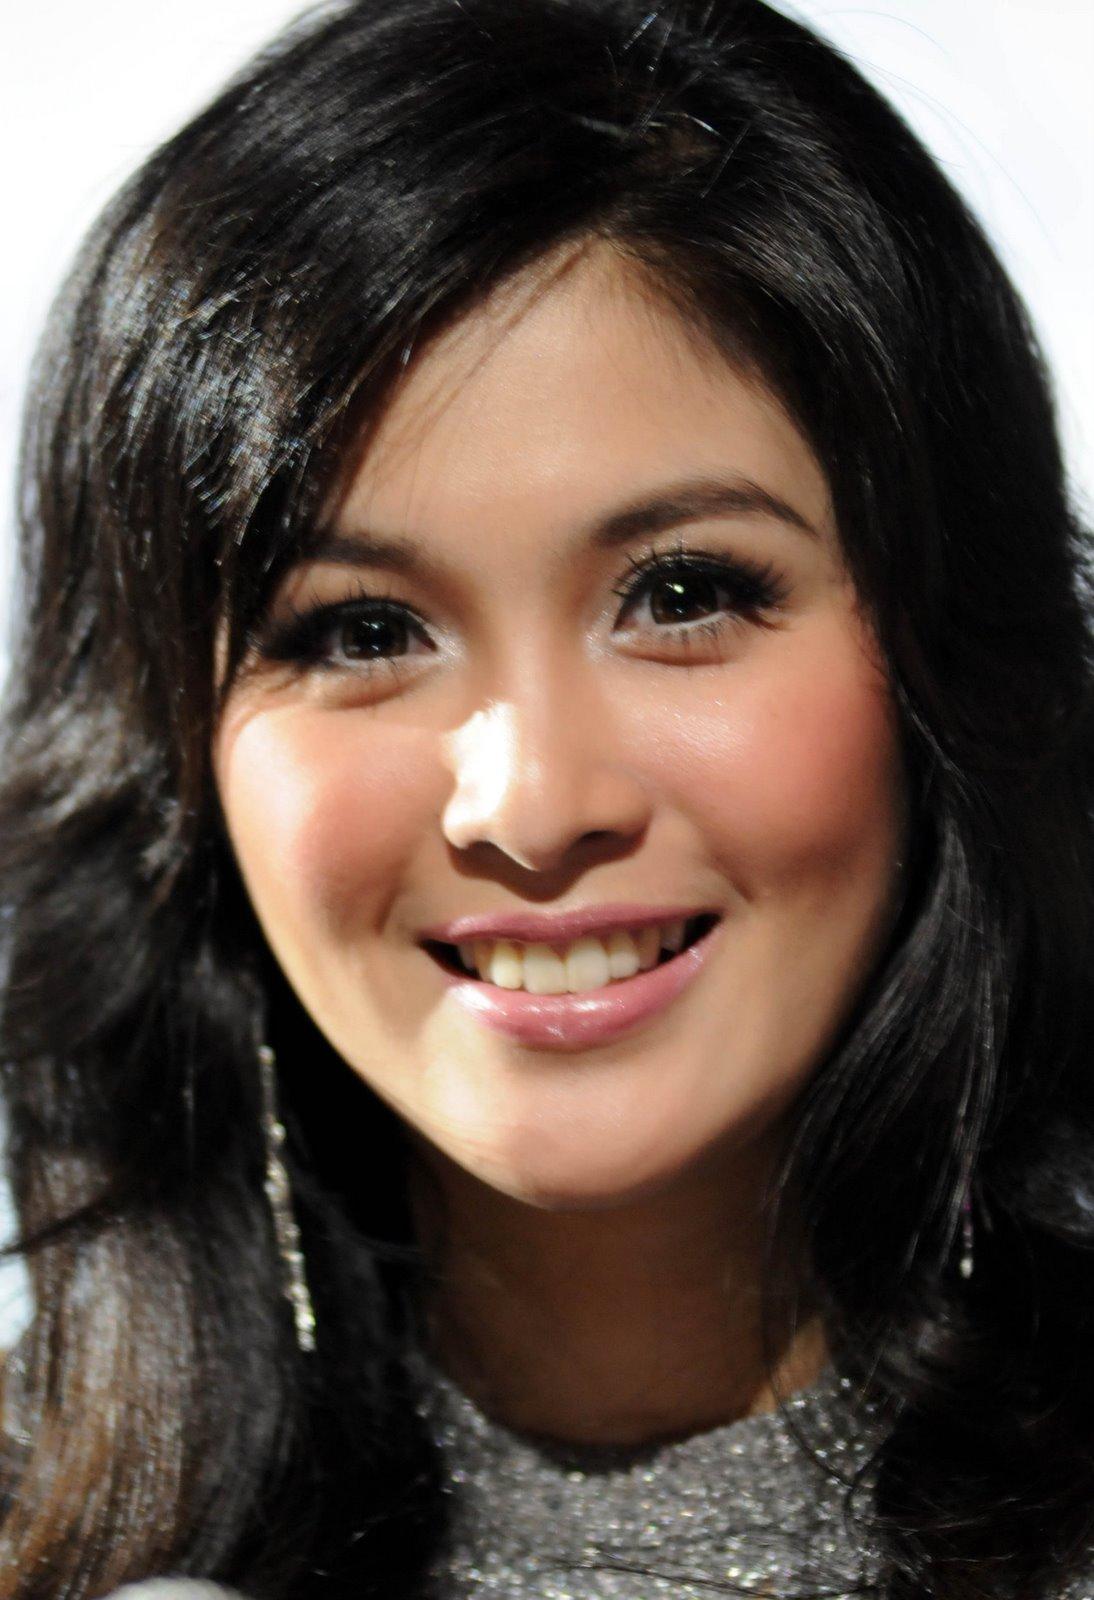 Sandra Dewi/hot/bugil/manis/seksi/cantik/bikini/telanjangcewek/sandra+dewi.jpg